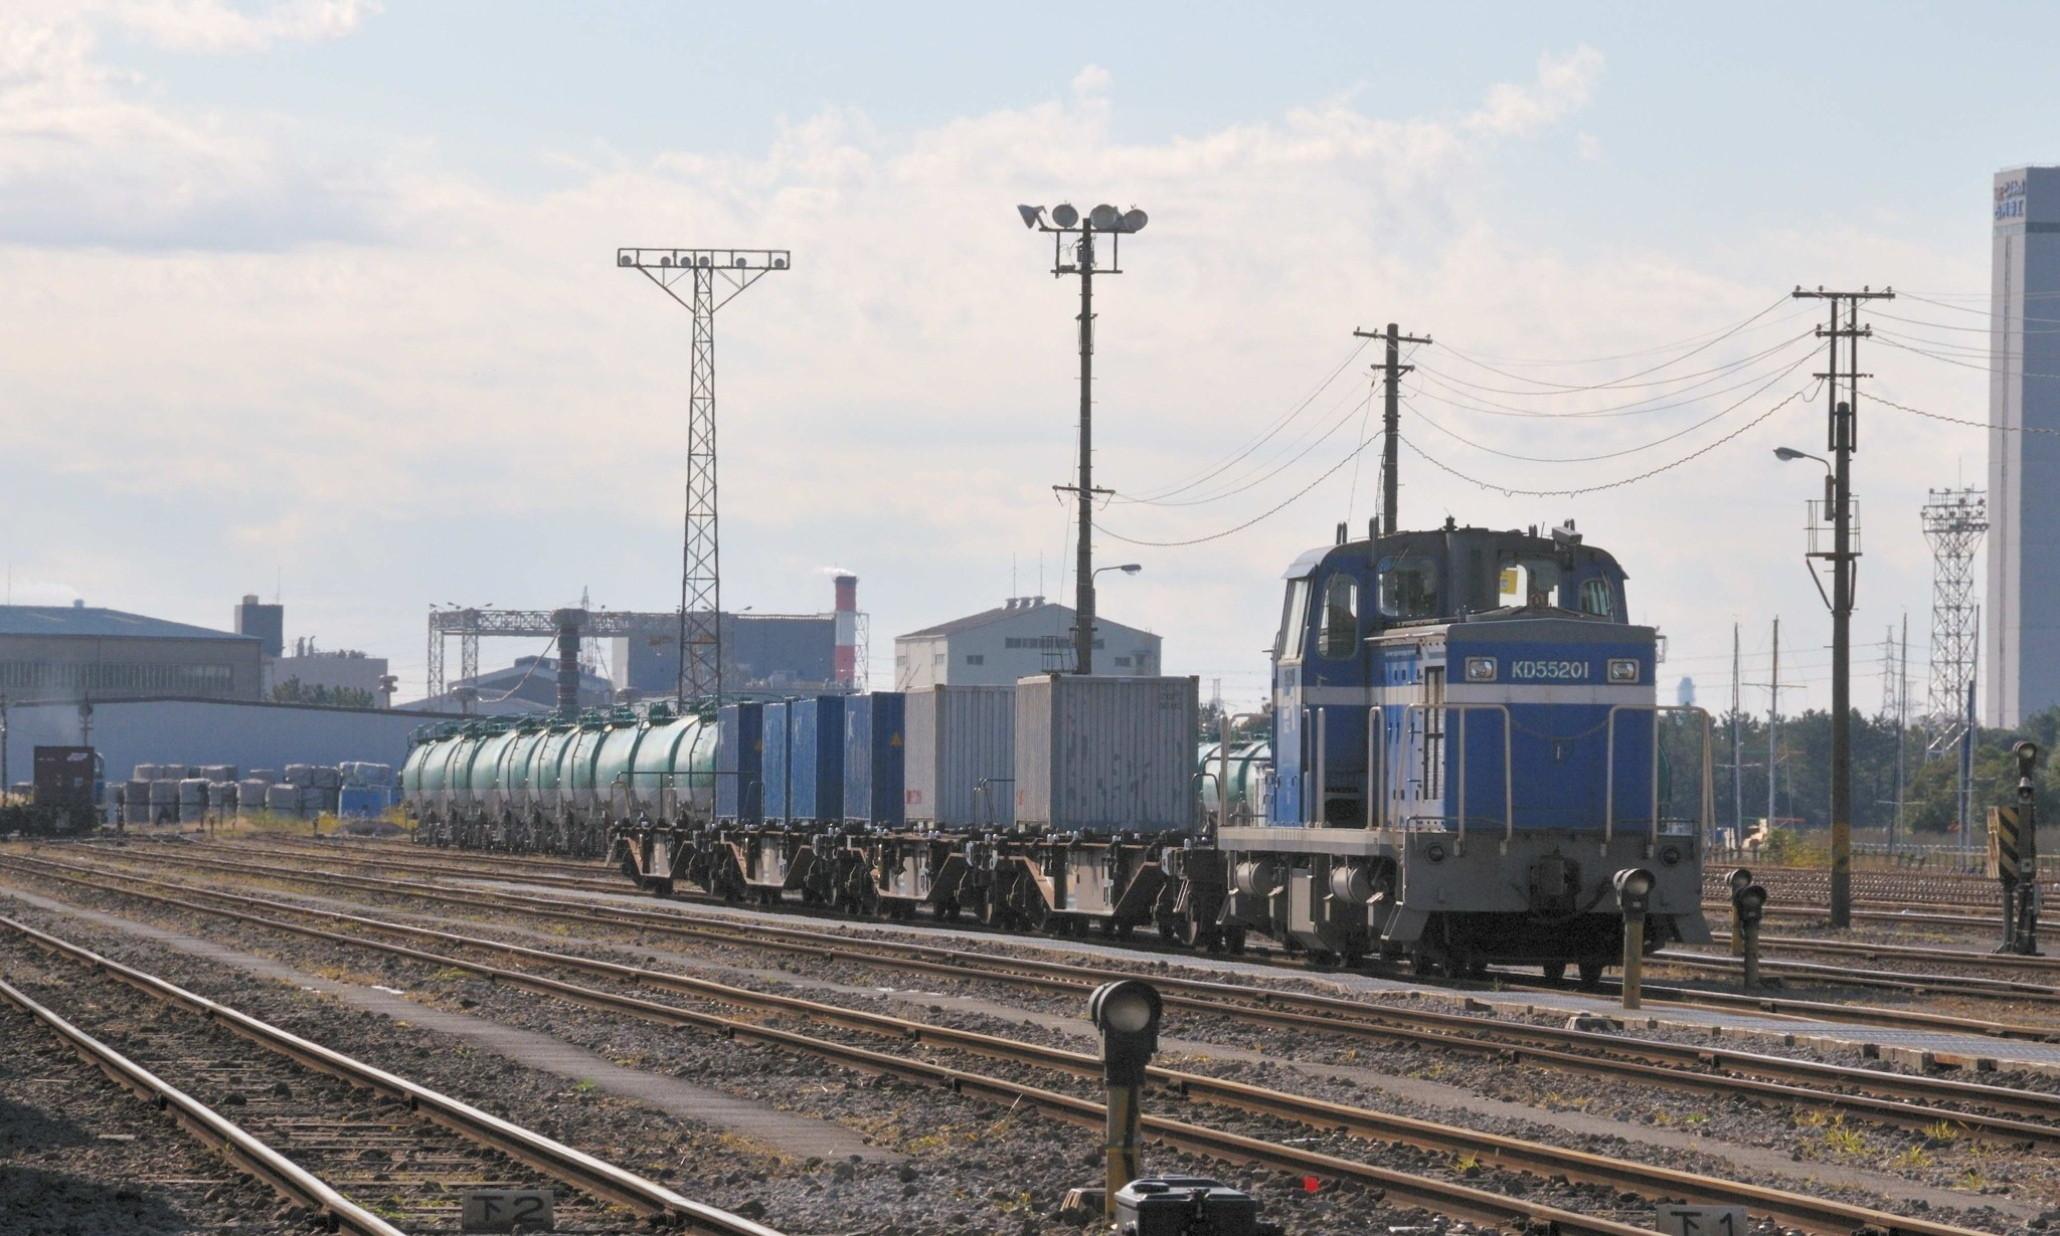 Keiyo_Rinkai_Railway_KD55_201